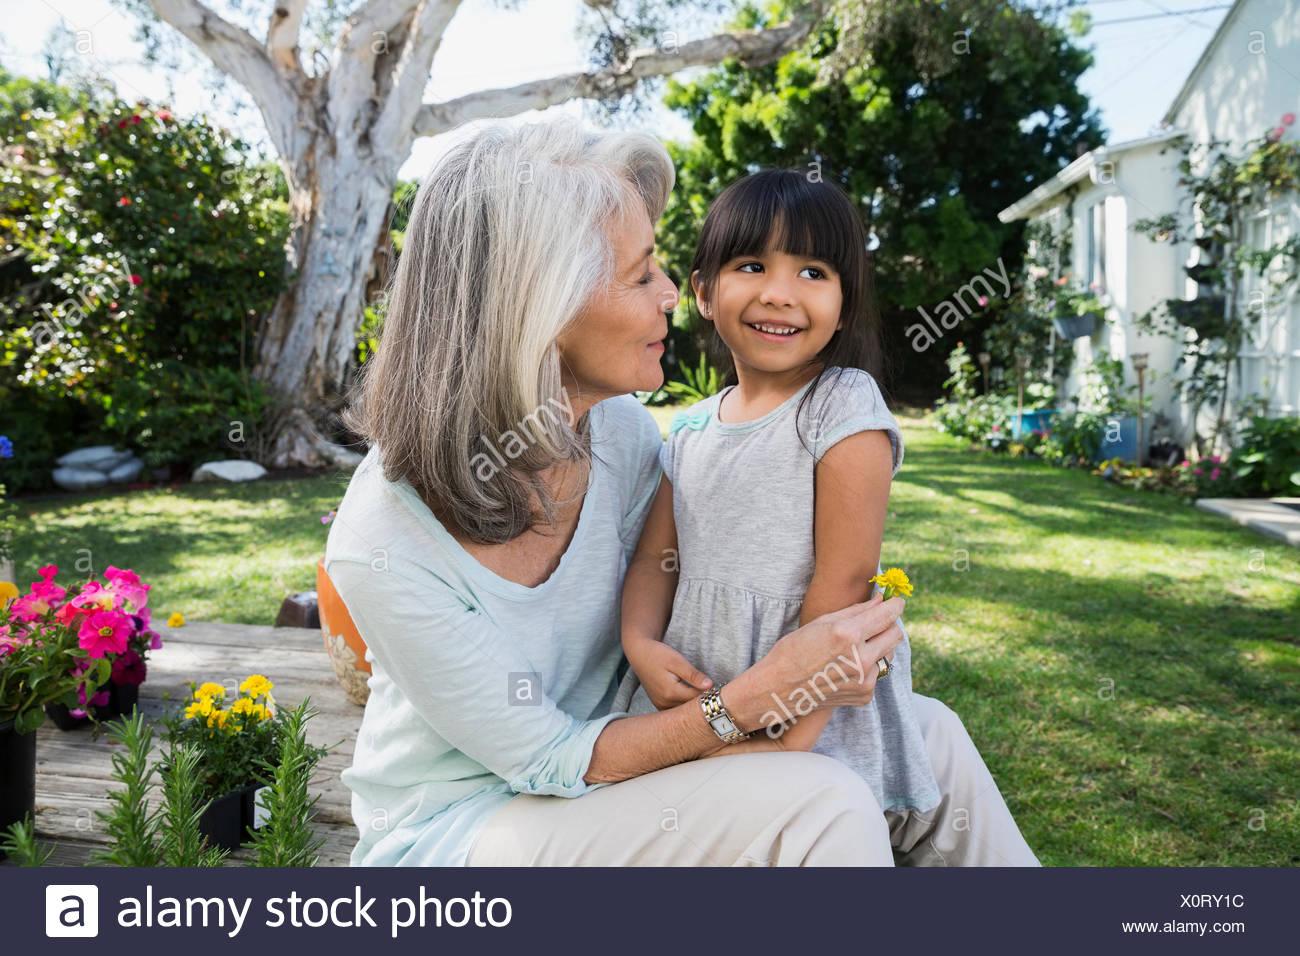 Granddaughter and grandmother hugging in backyard garden - Stock Image